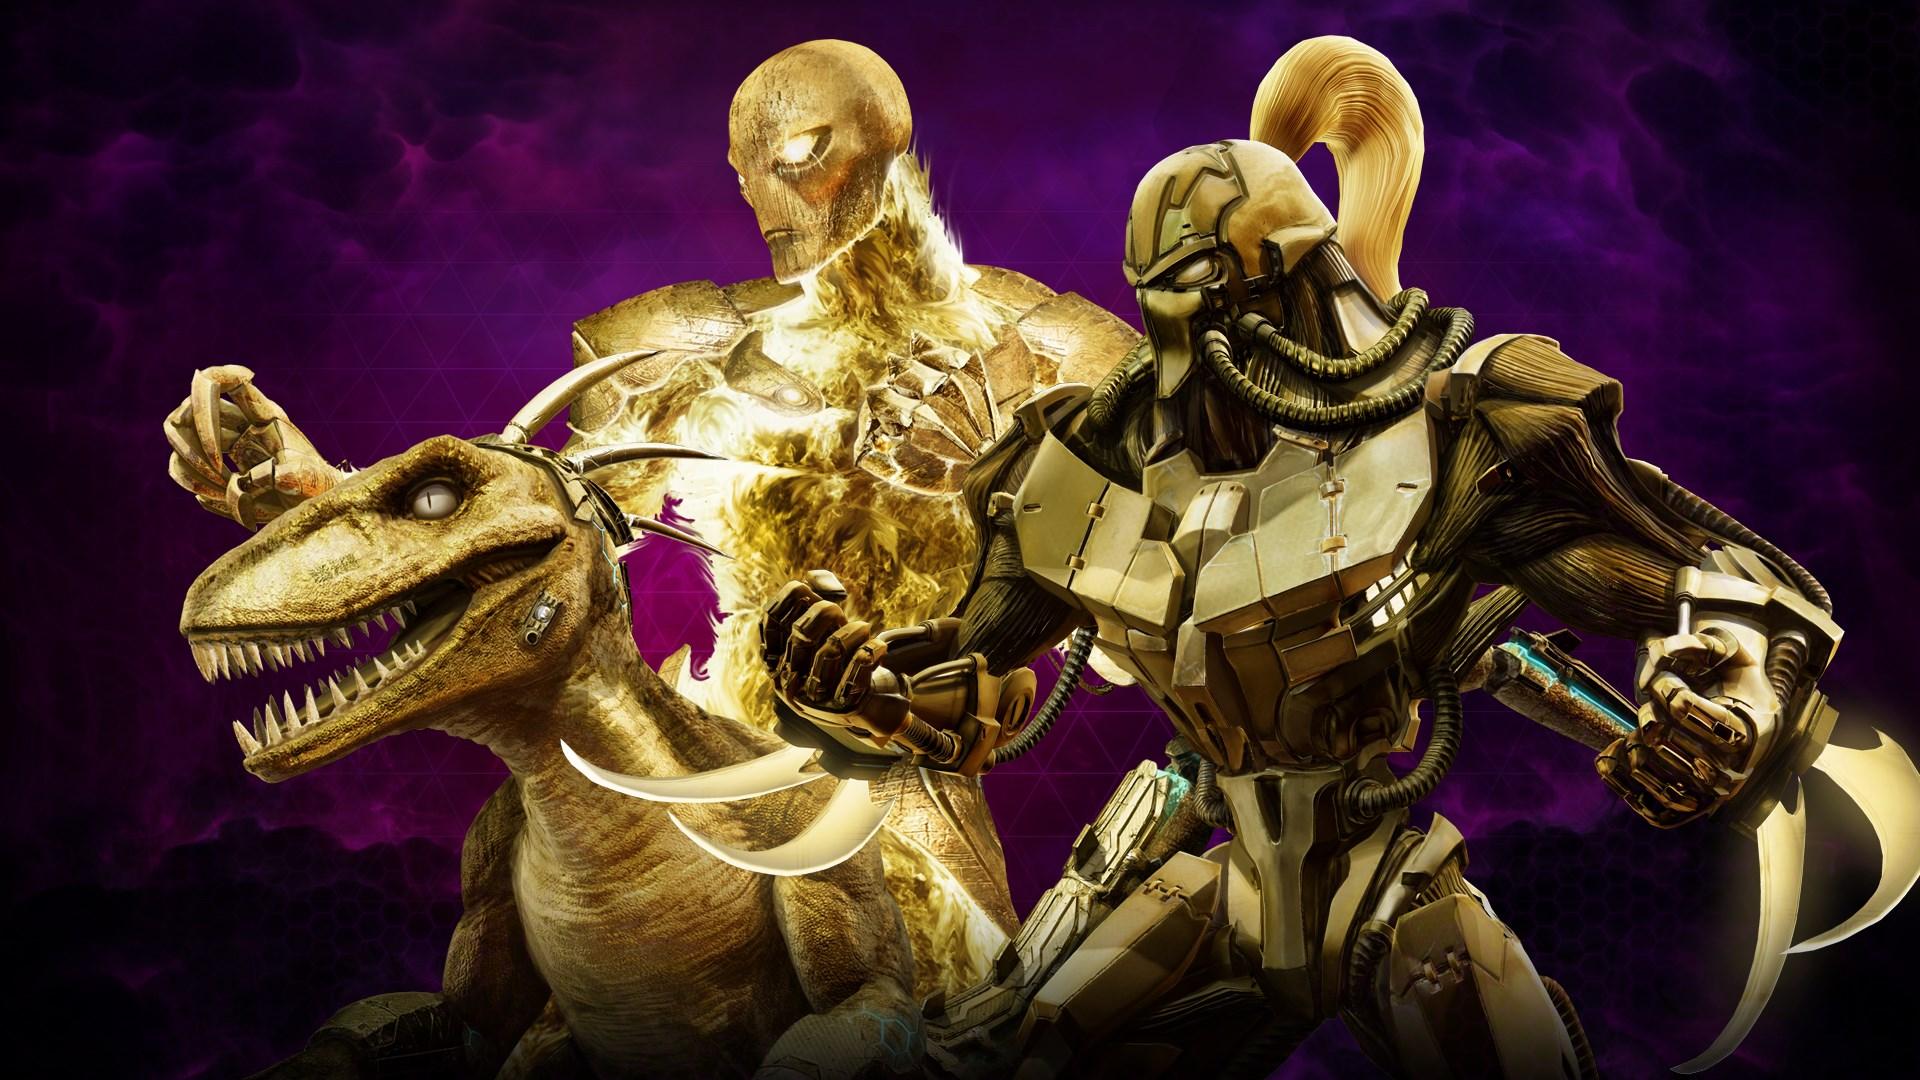 Gold Skin Pack 5